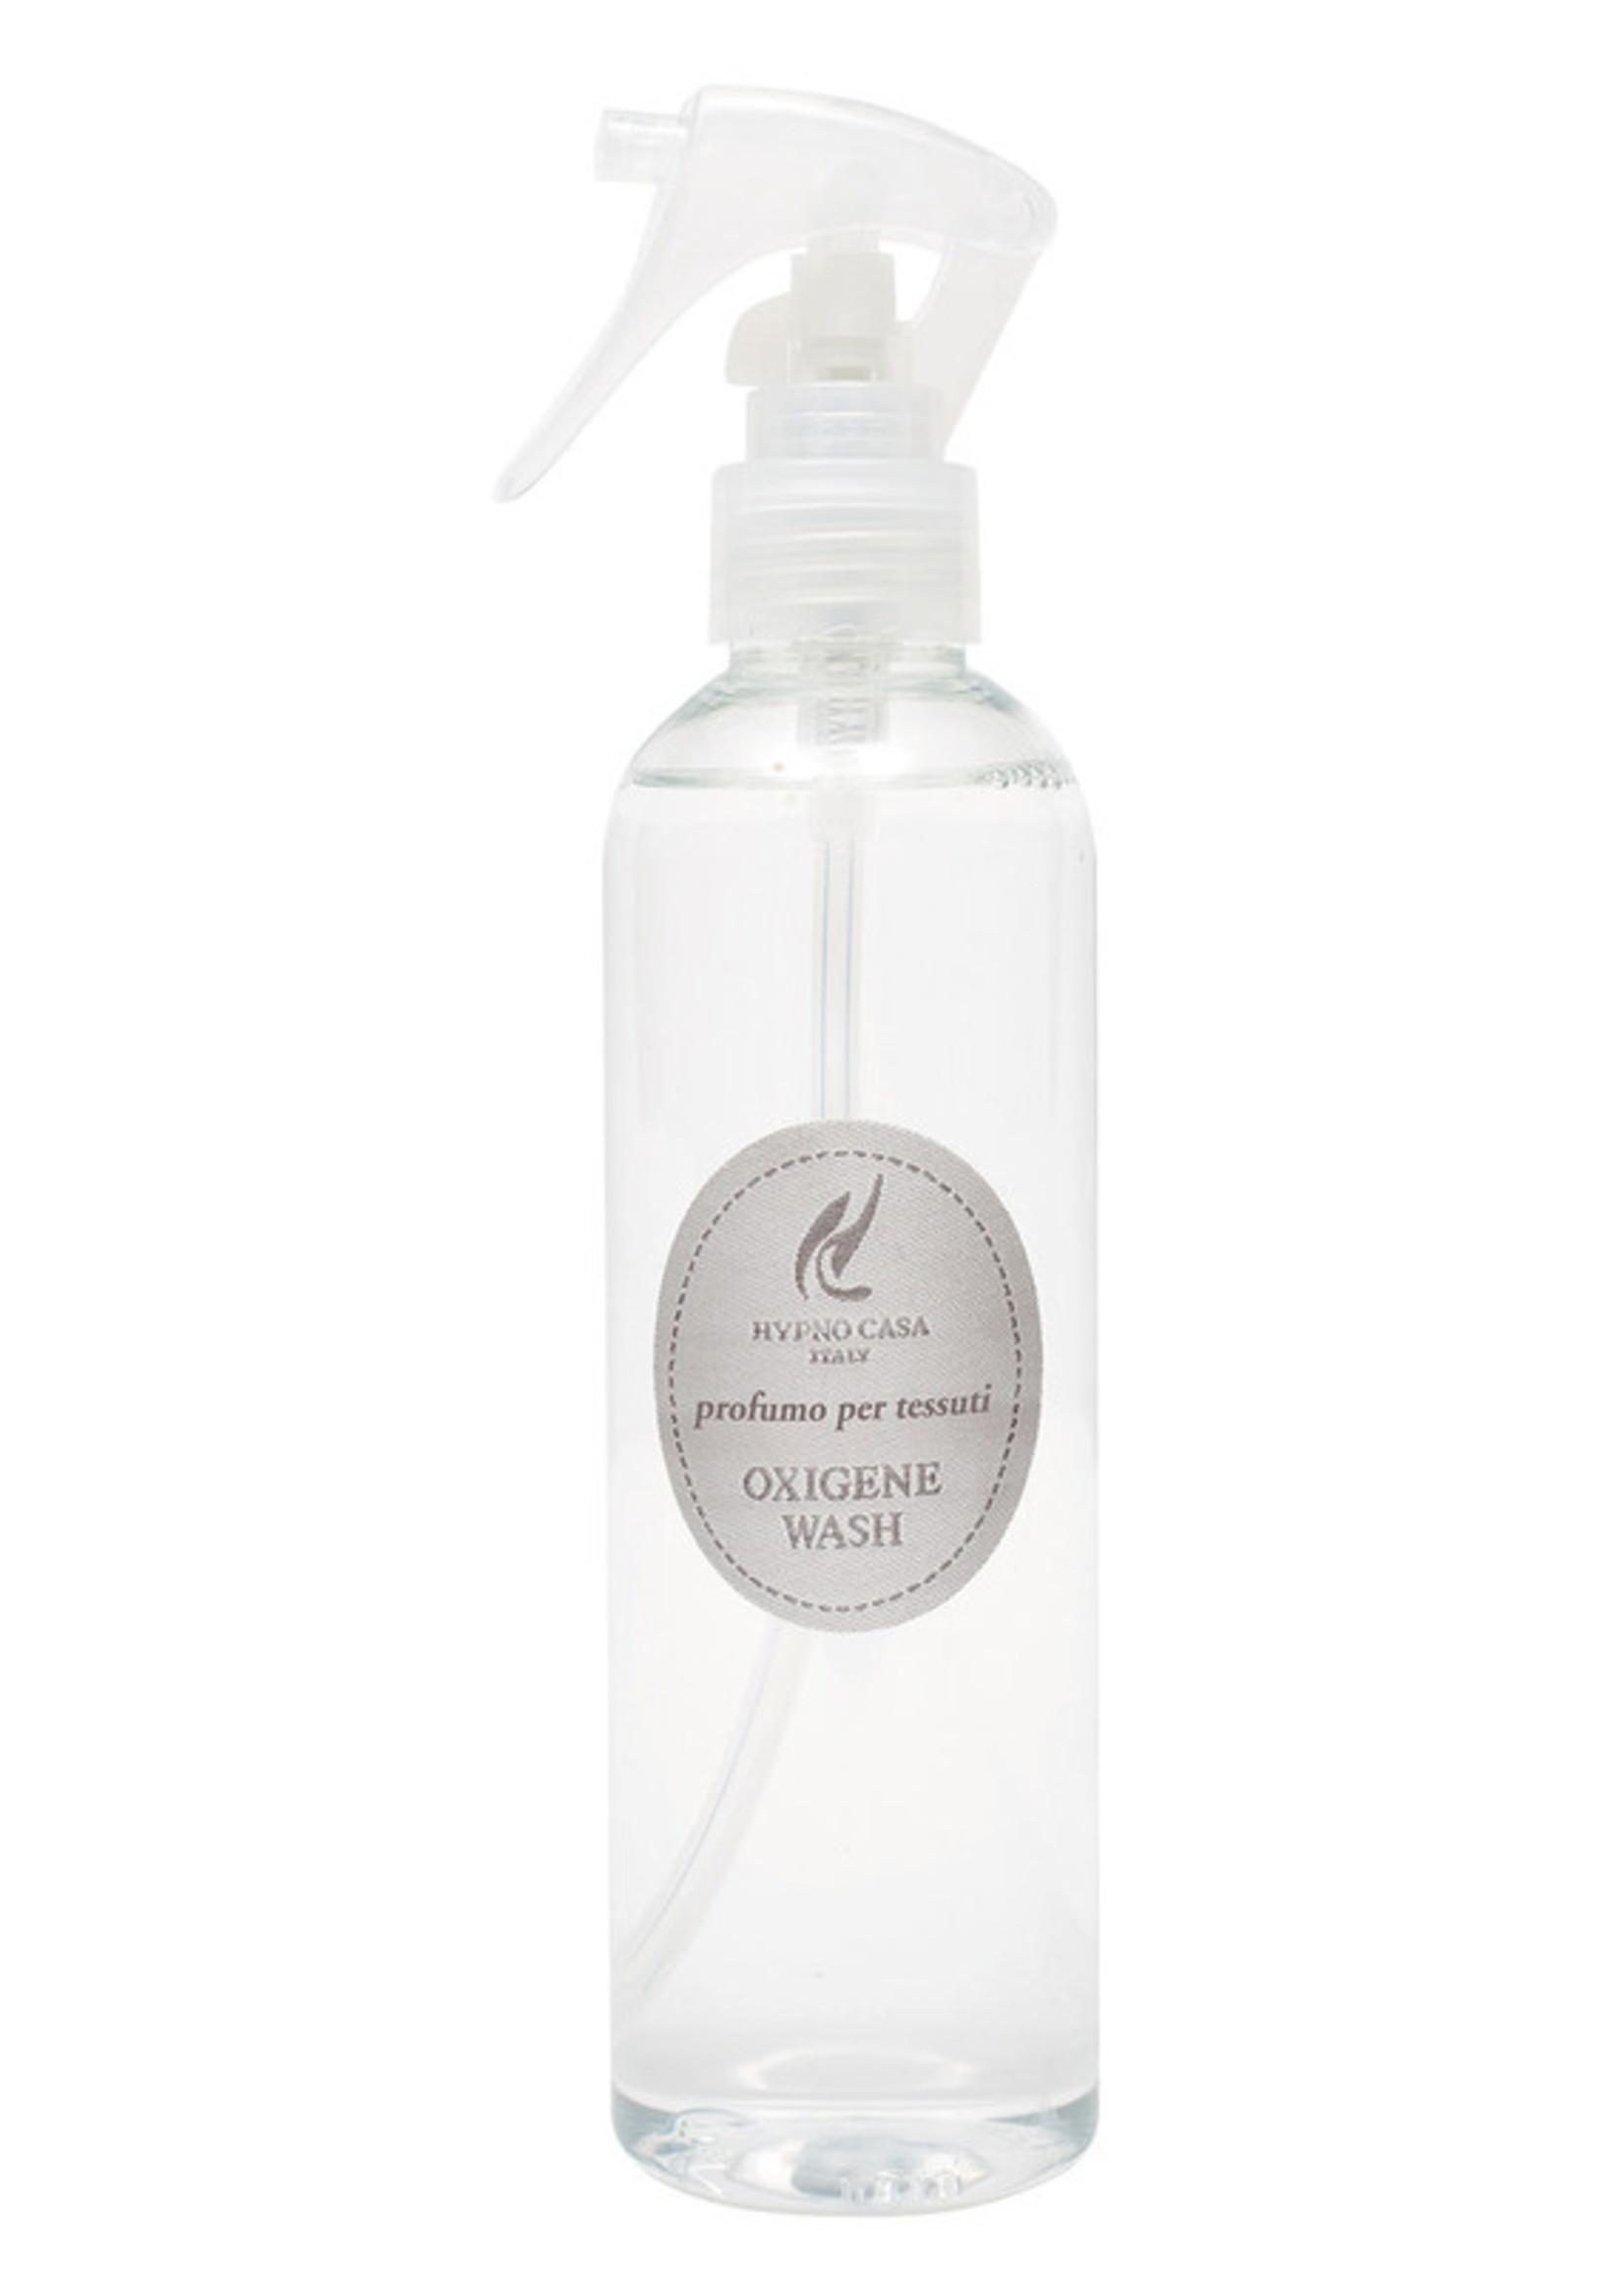 Hypno Casa Roomspray Oxigene Wash